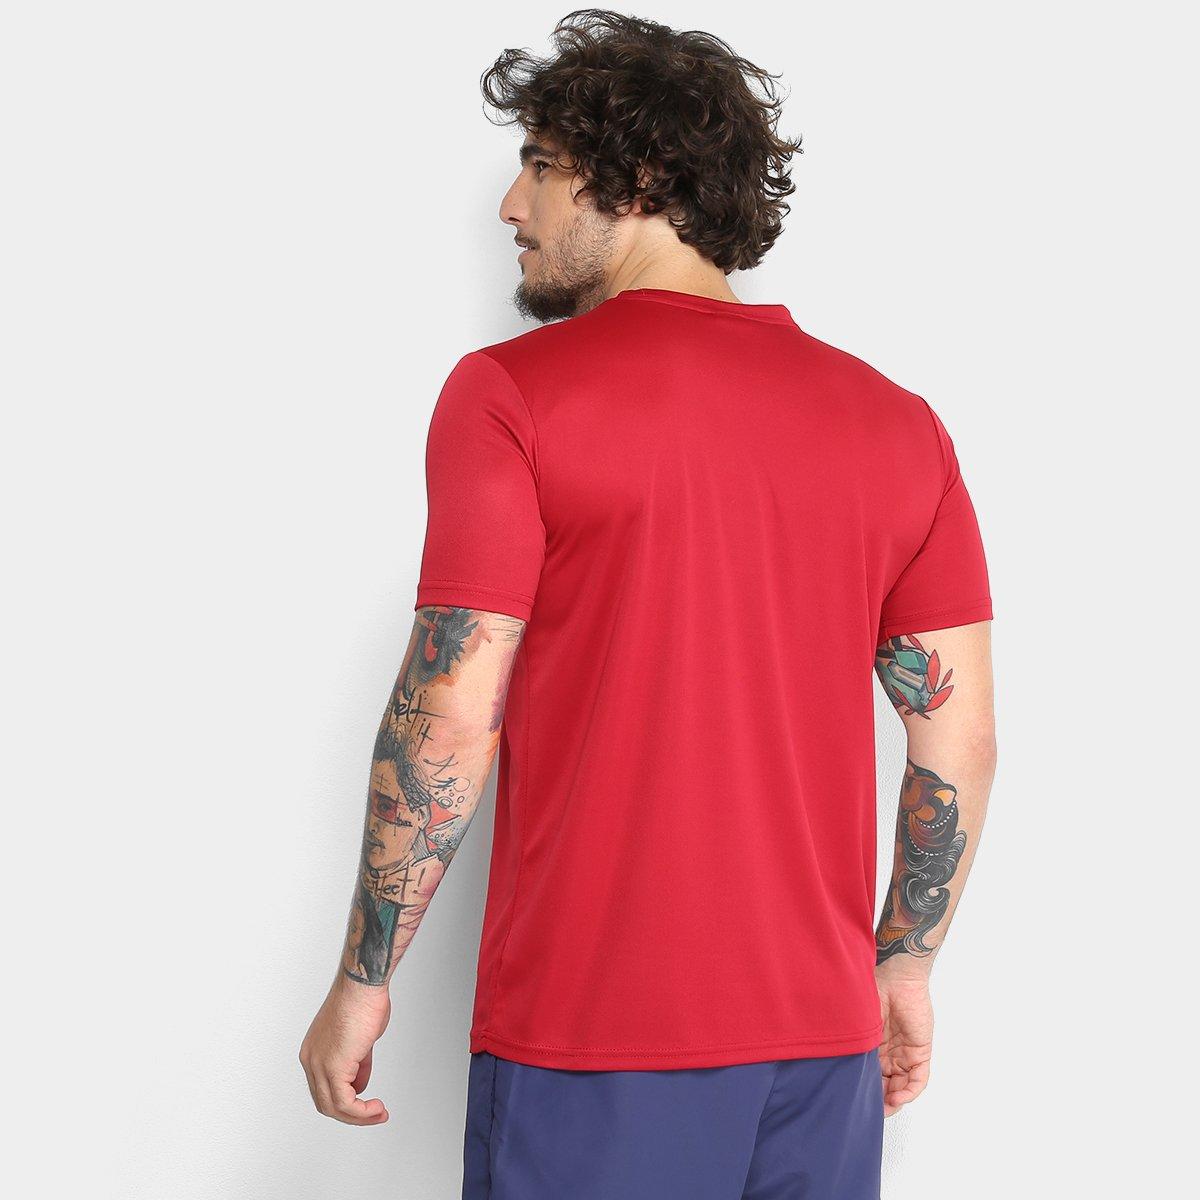 ... Foto 2 - Camiseta Avia Bummer Masculina ... 5b91bb52214b9